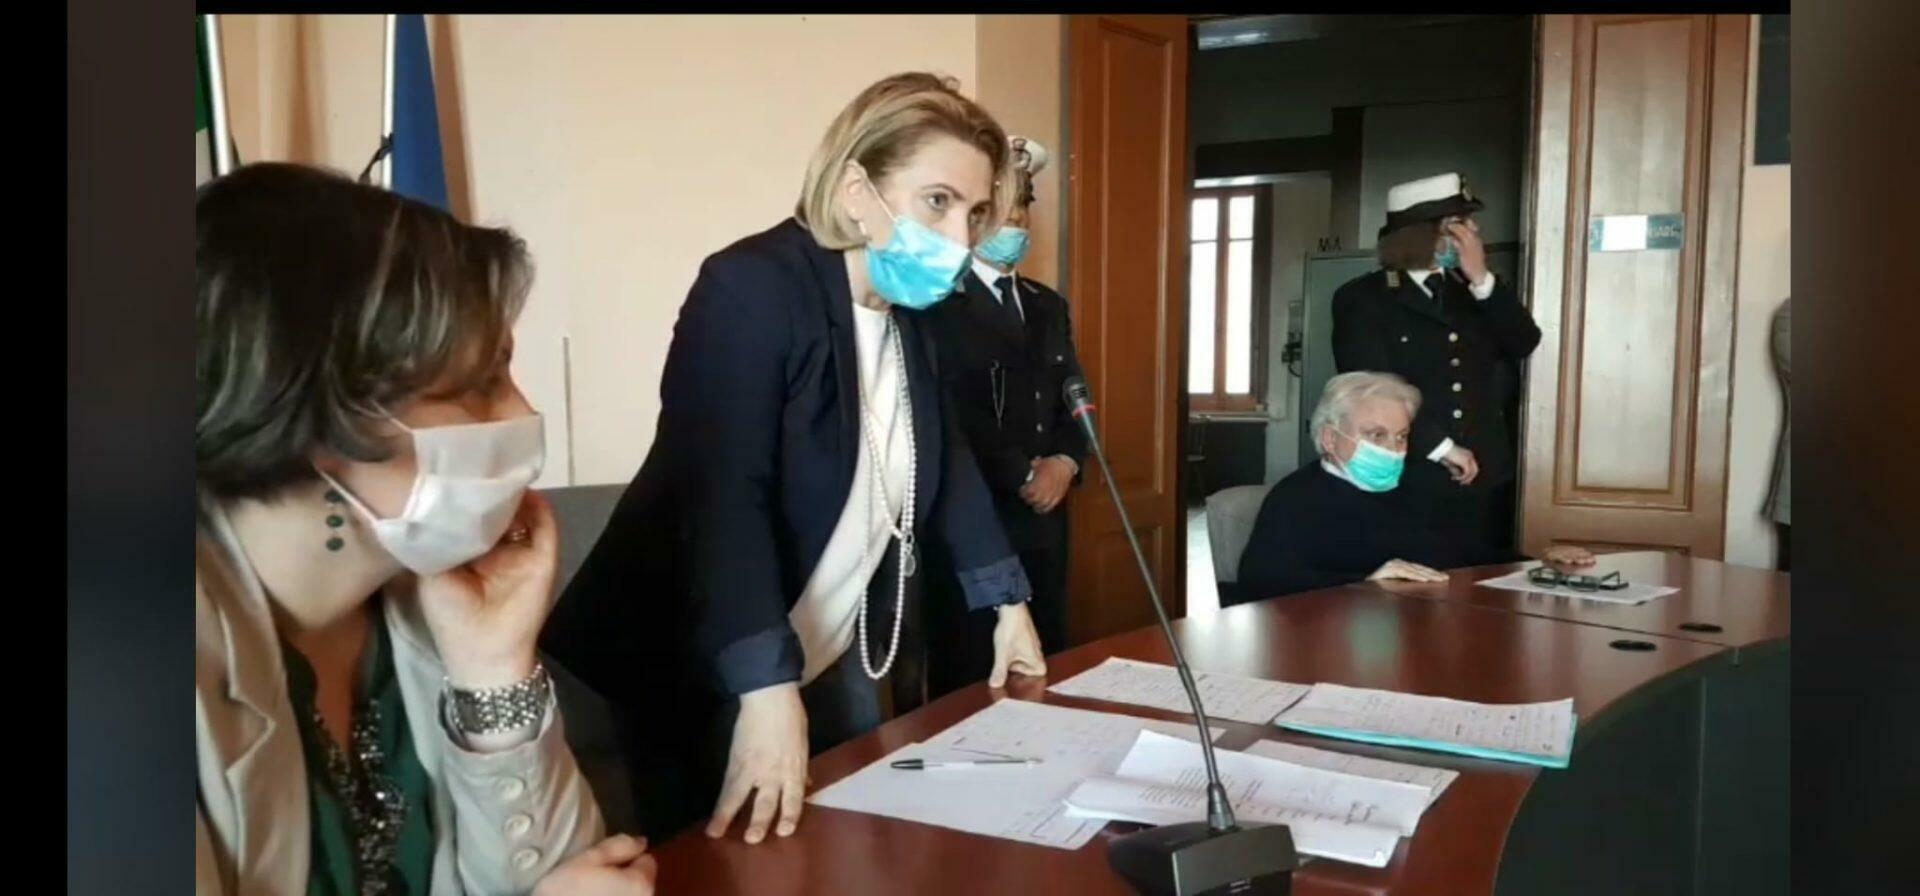 La proposta di Ciavula: I consigli comunali di Caulonia vengano trasmessi sempre in diretta streaming